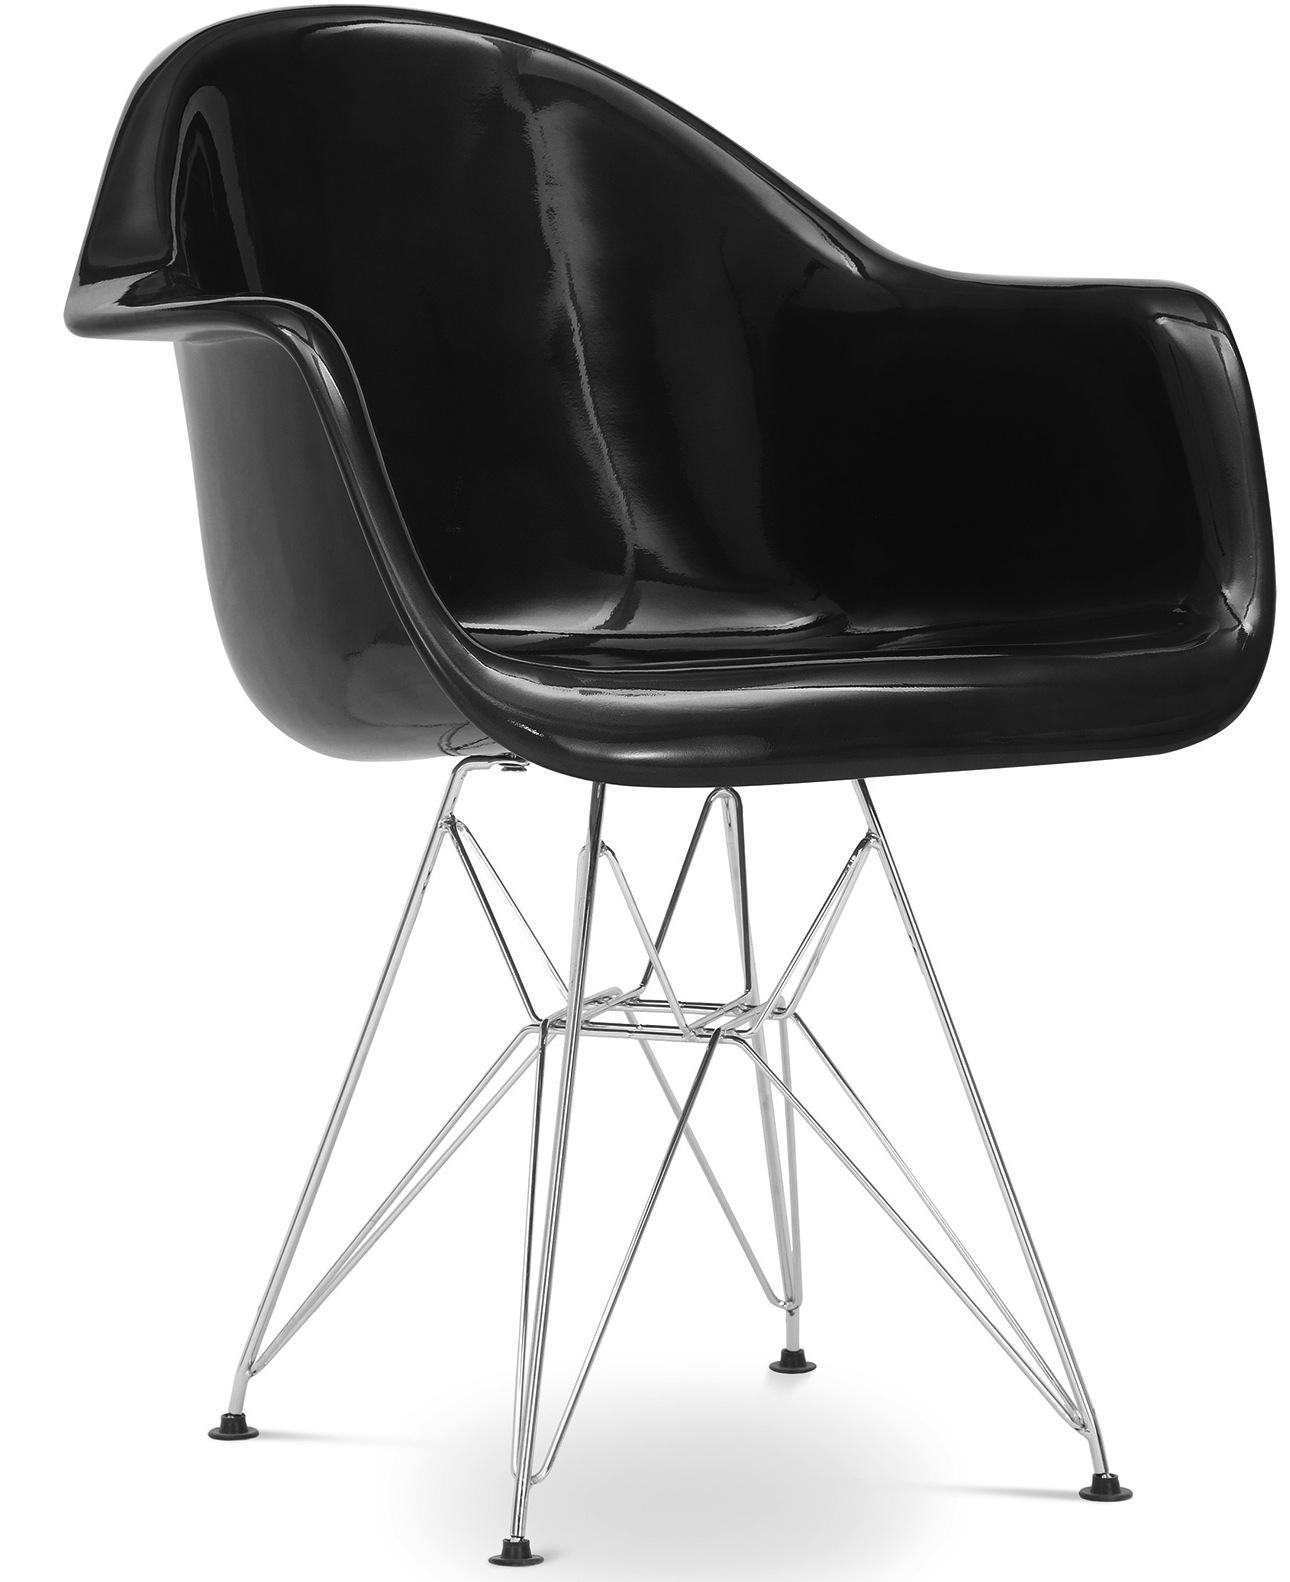 fauteuil polypropyl ne noire inspir e eiffel charles eames. Black Bedroom Furniture Sets. Home Design Ideas